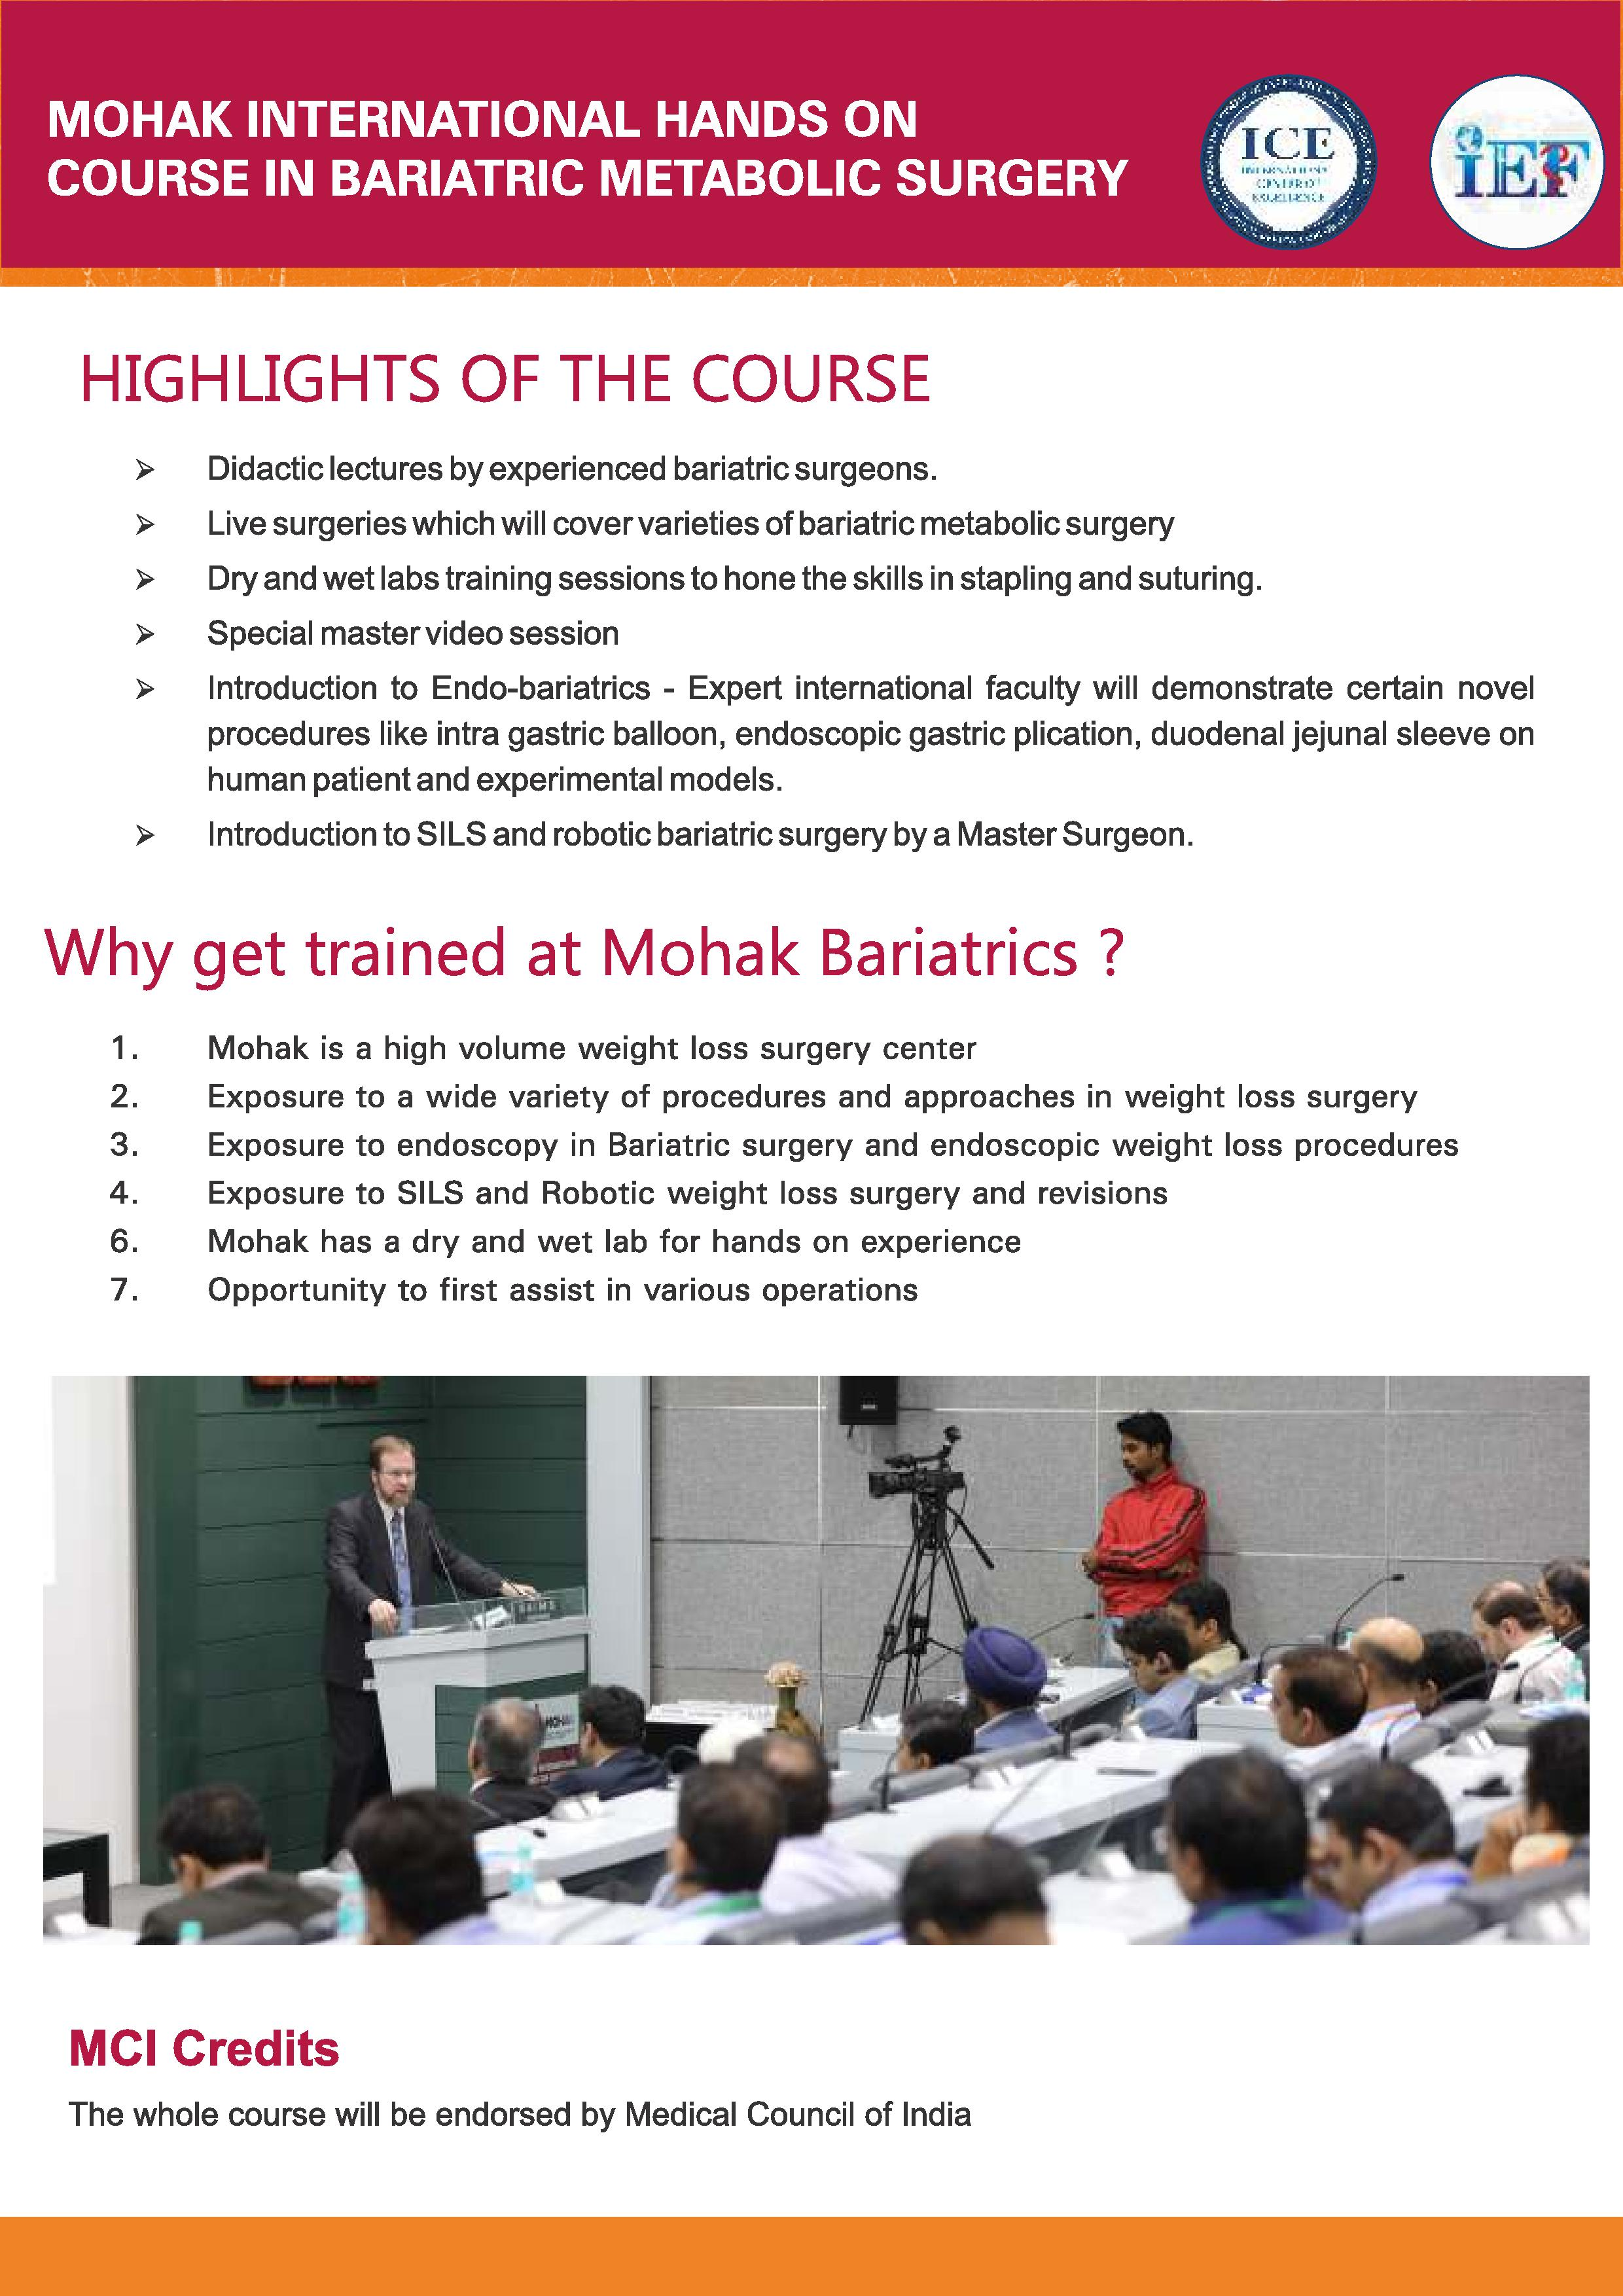 bariatric surgery workshop dr.fobi may 2017 (6)